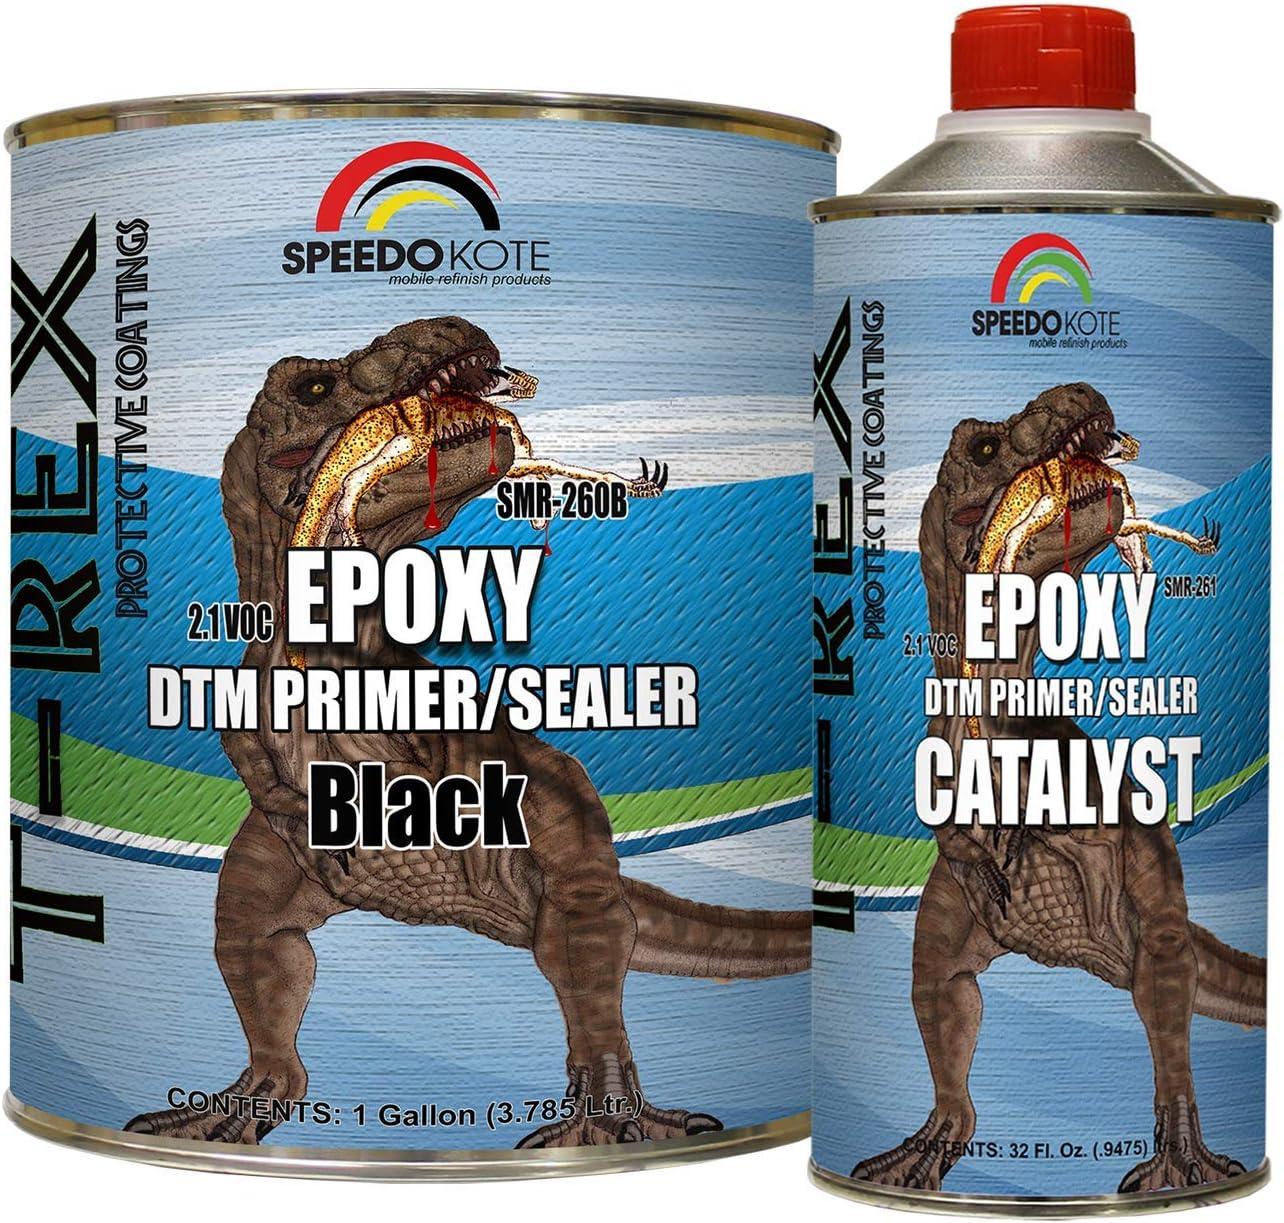 Speedokote Epoxy Fast Dry DTM Primer & Sealer